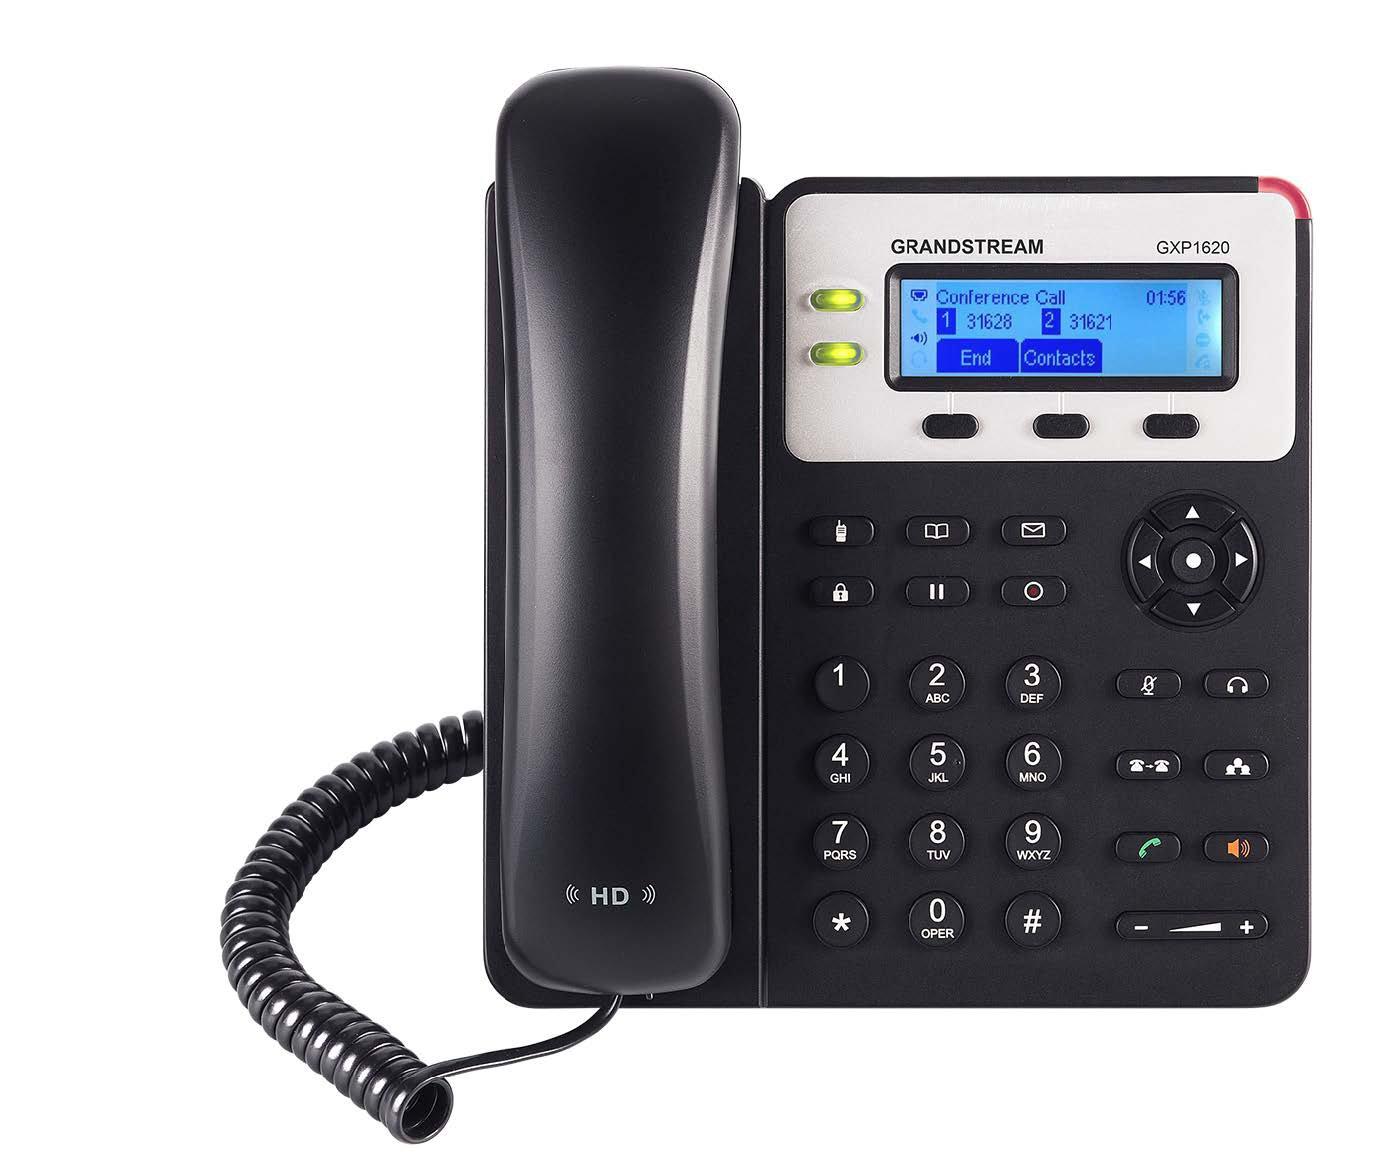 Grandstream GXP1620 IP Phone Front